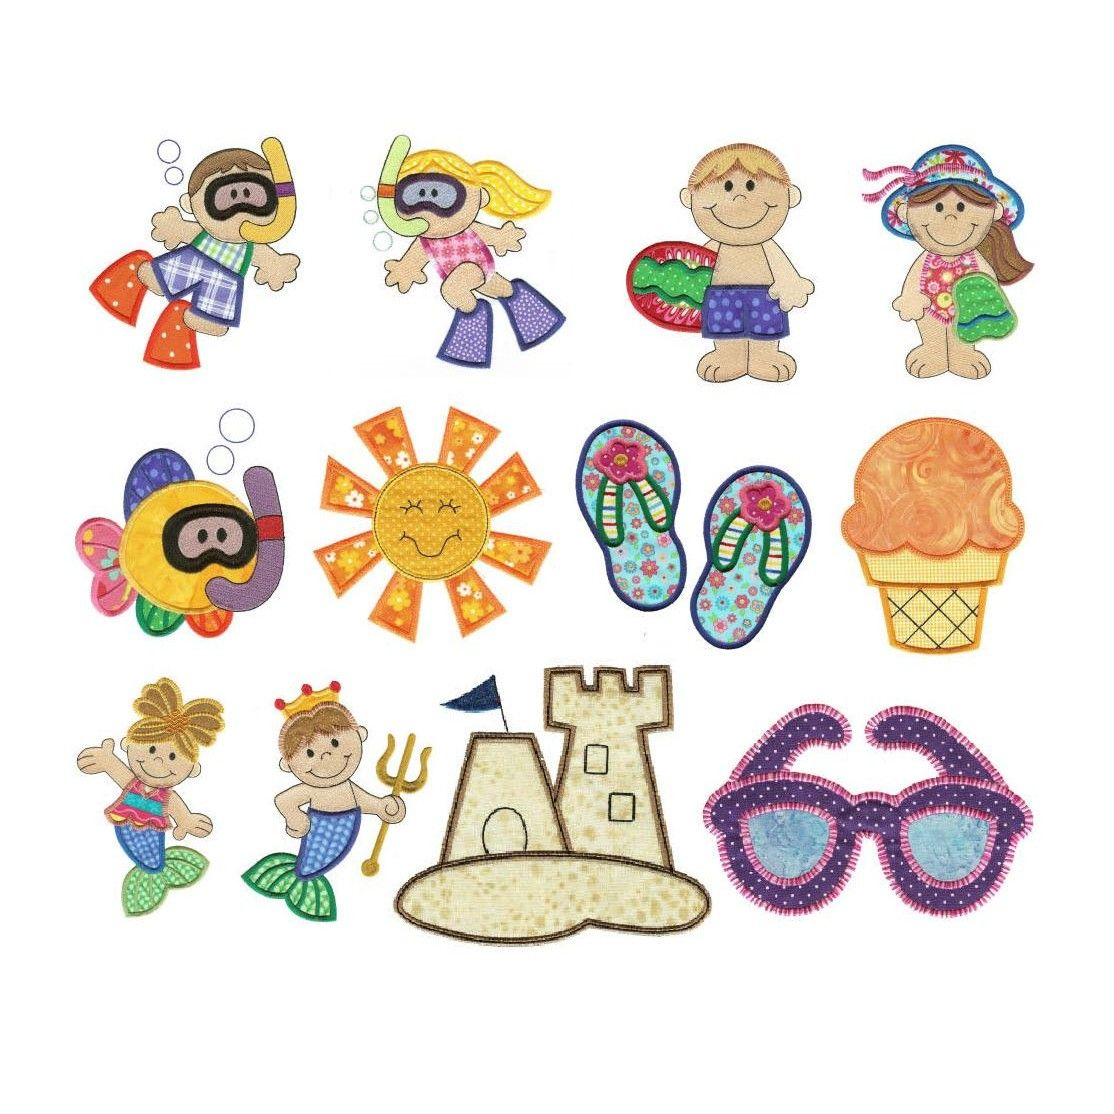 Summer beach scuba diving and mermaids applique machine embroidery designs